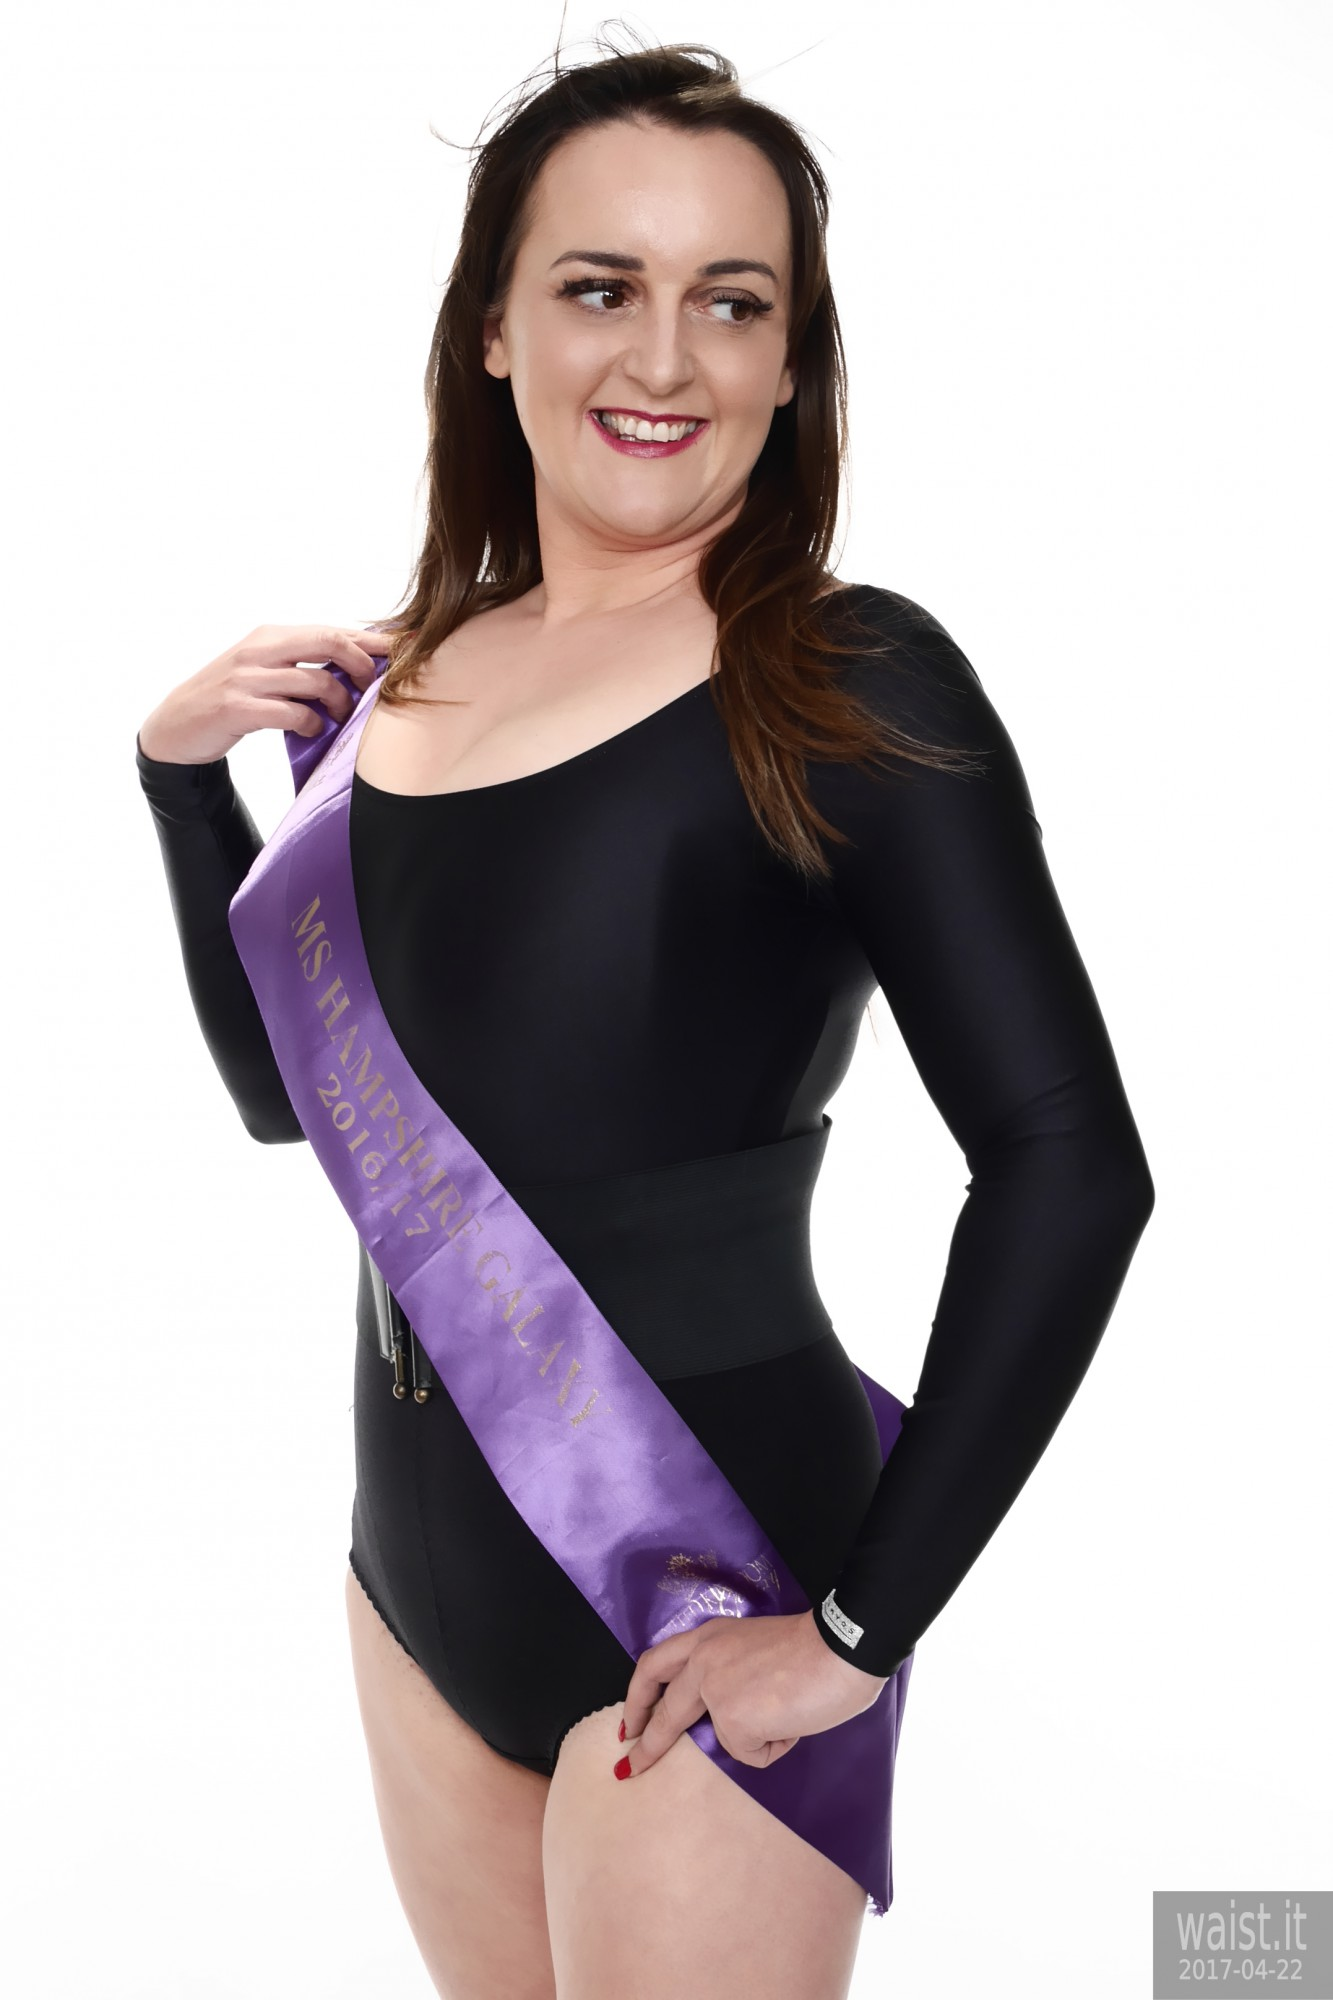 2017-04-22 Patsy black leotard and purple beauty pageant sash